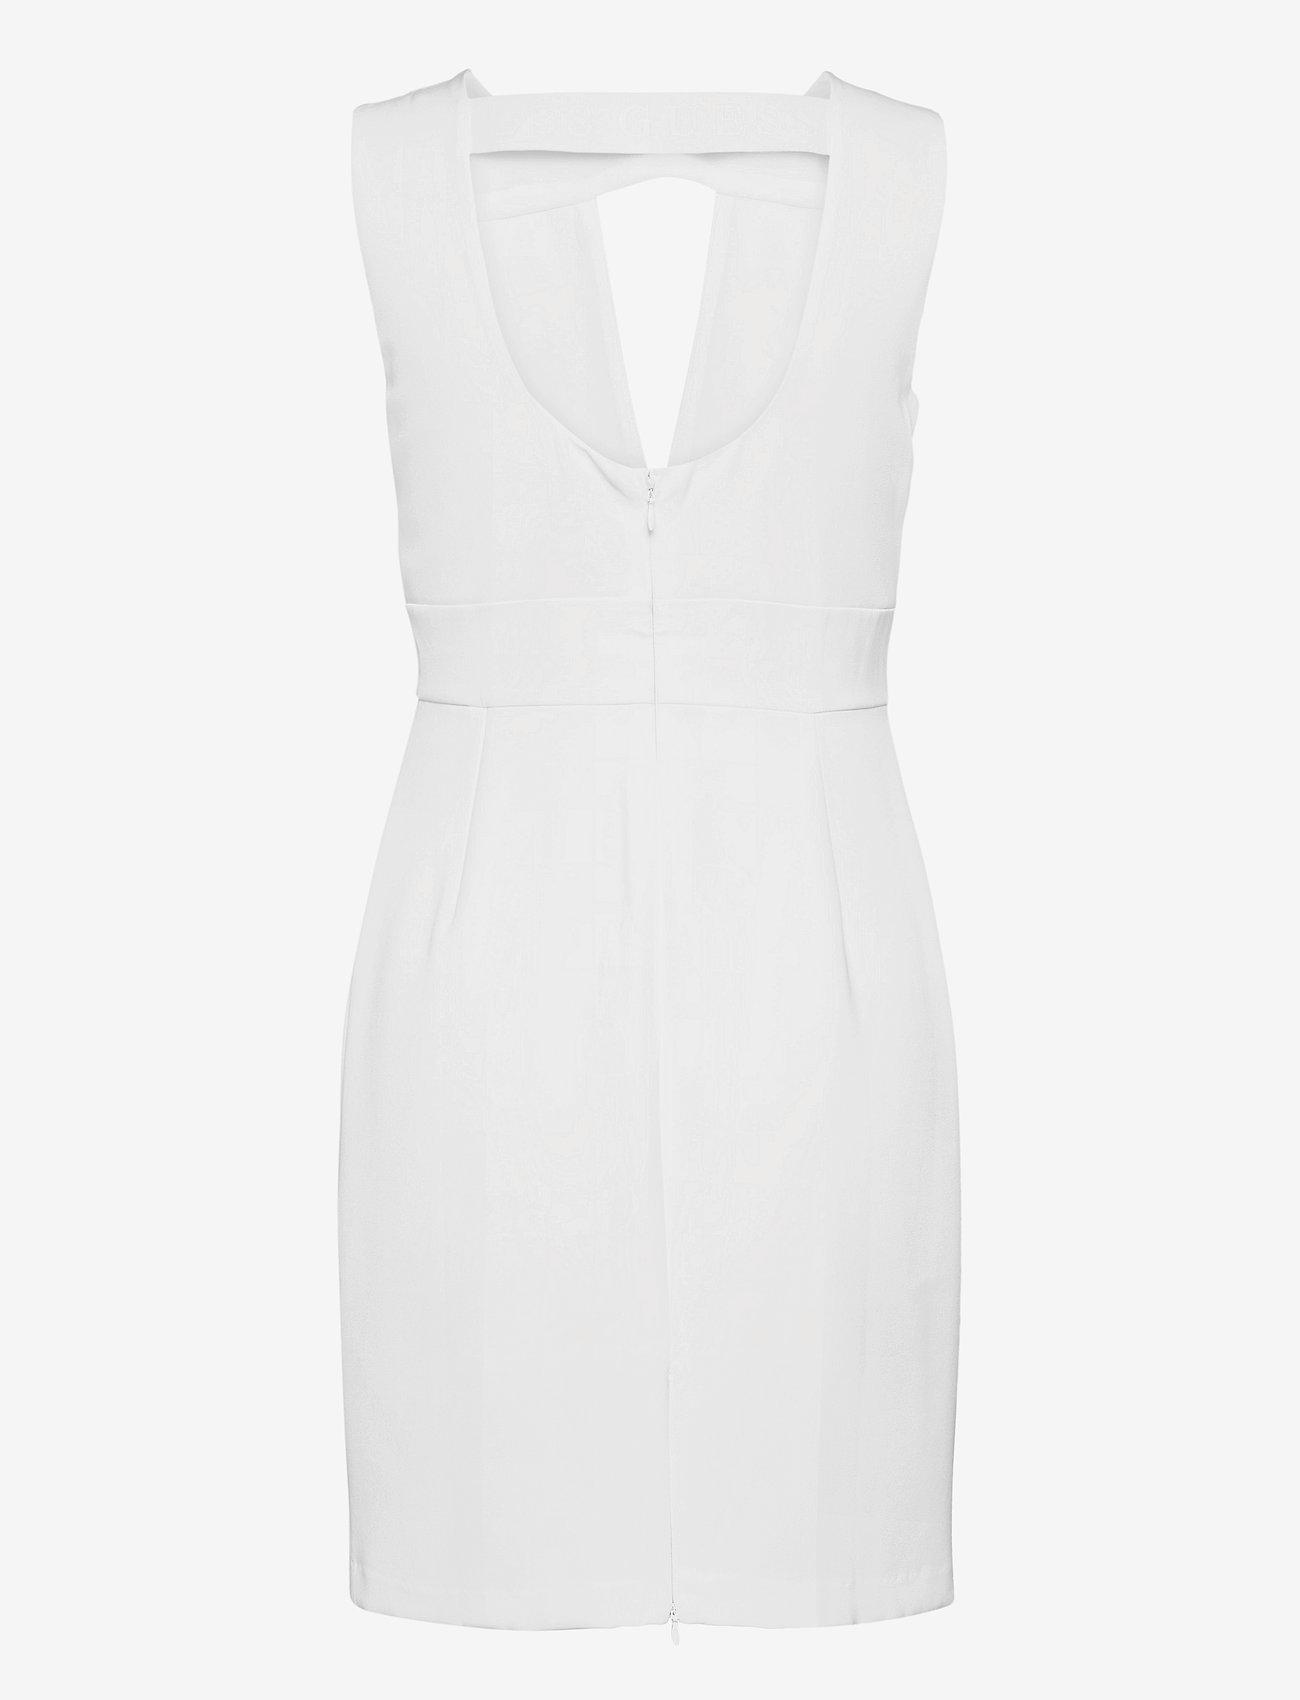 GUESS Jeans - PATTI DRESS - sommarklänningar - true white a000 - 1